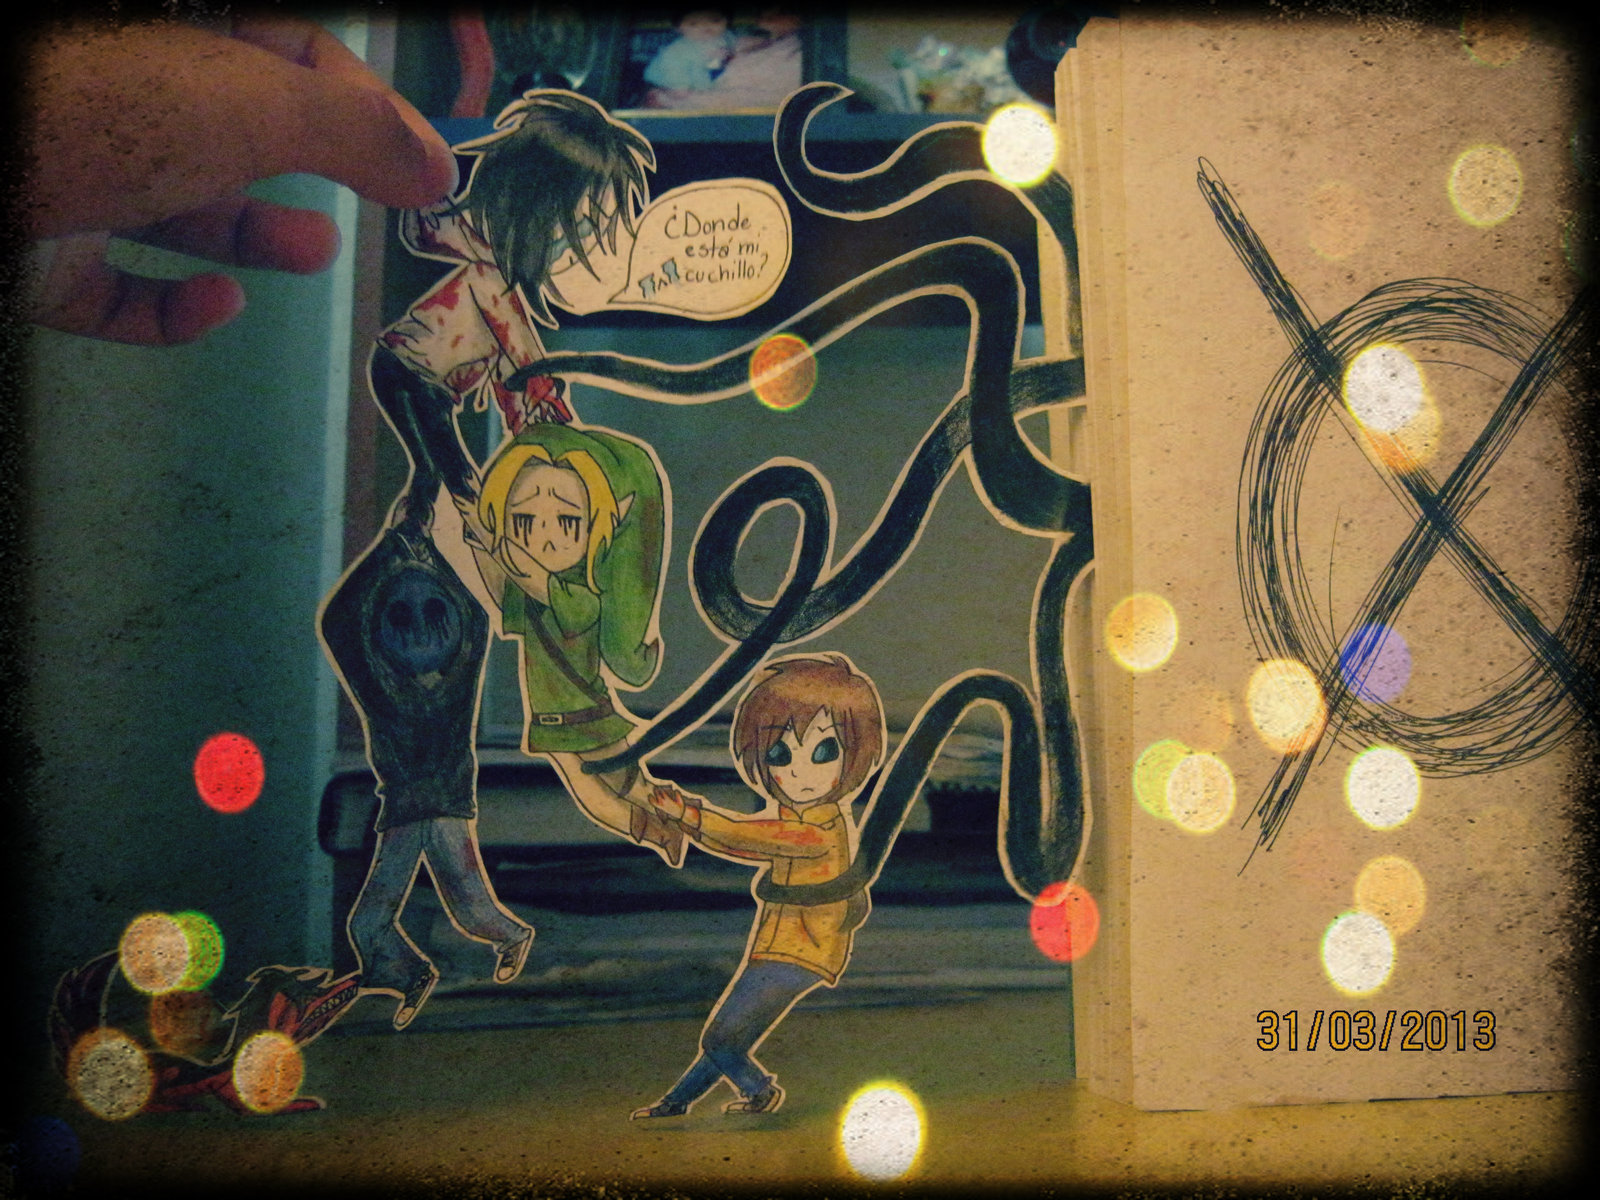 Paper Child Creepypasta by Sussett on deviantART 1600x1200